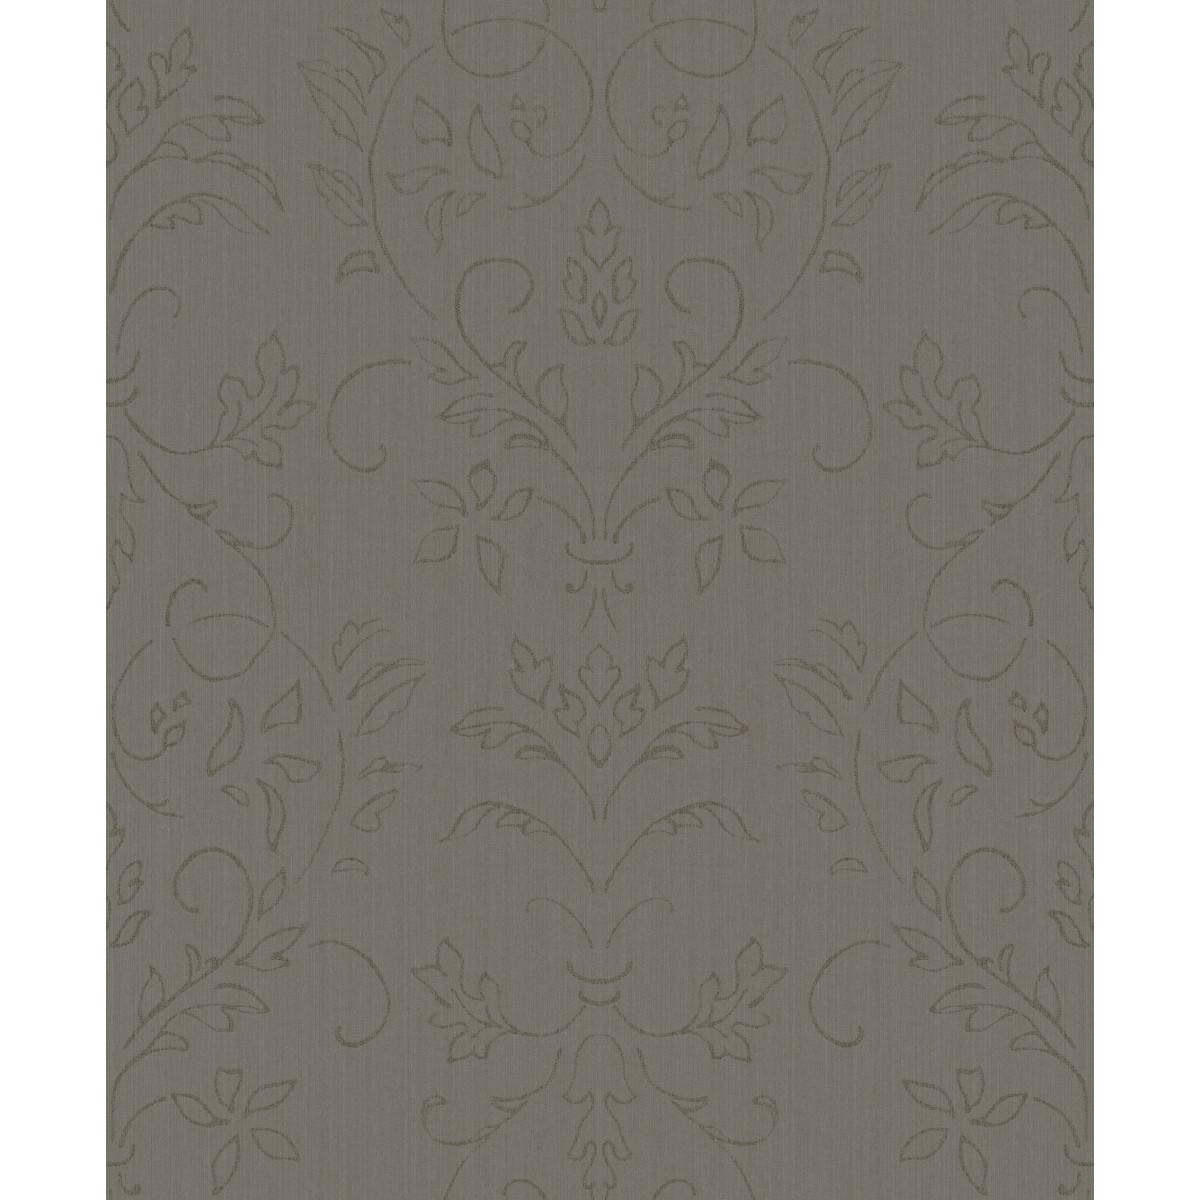 Обои текстильные Architects Paper Haute Couture3 серые 0.53 м 2906-56